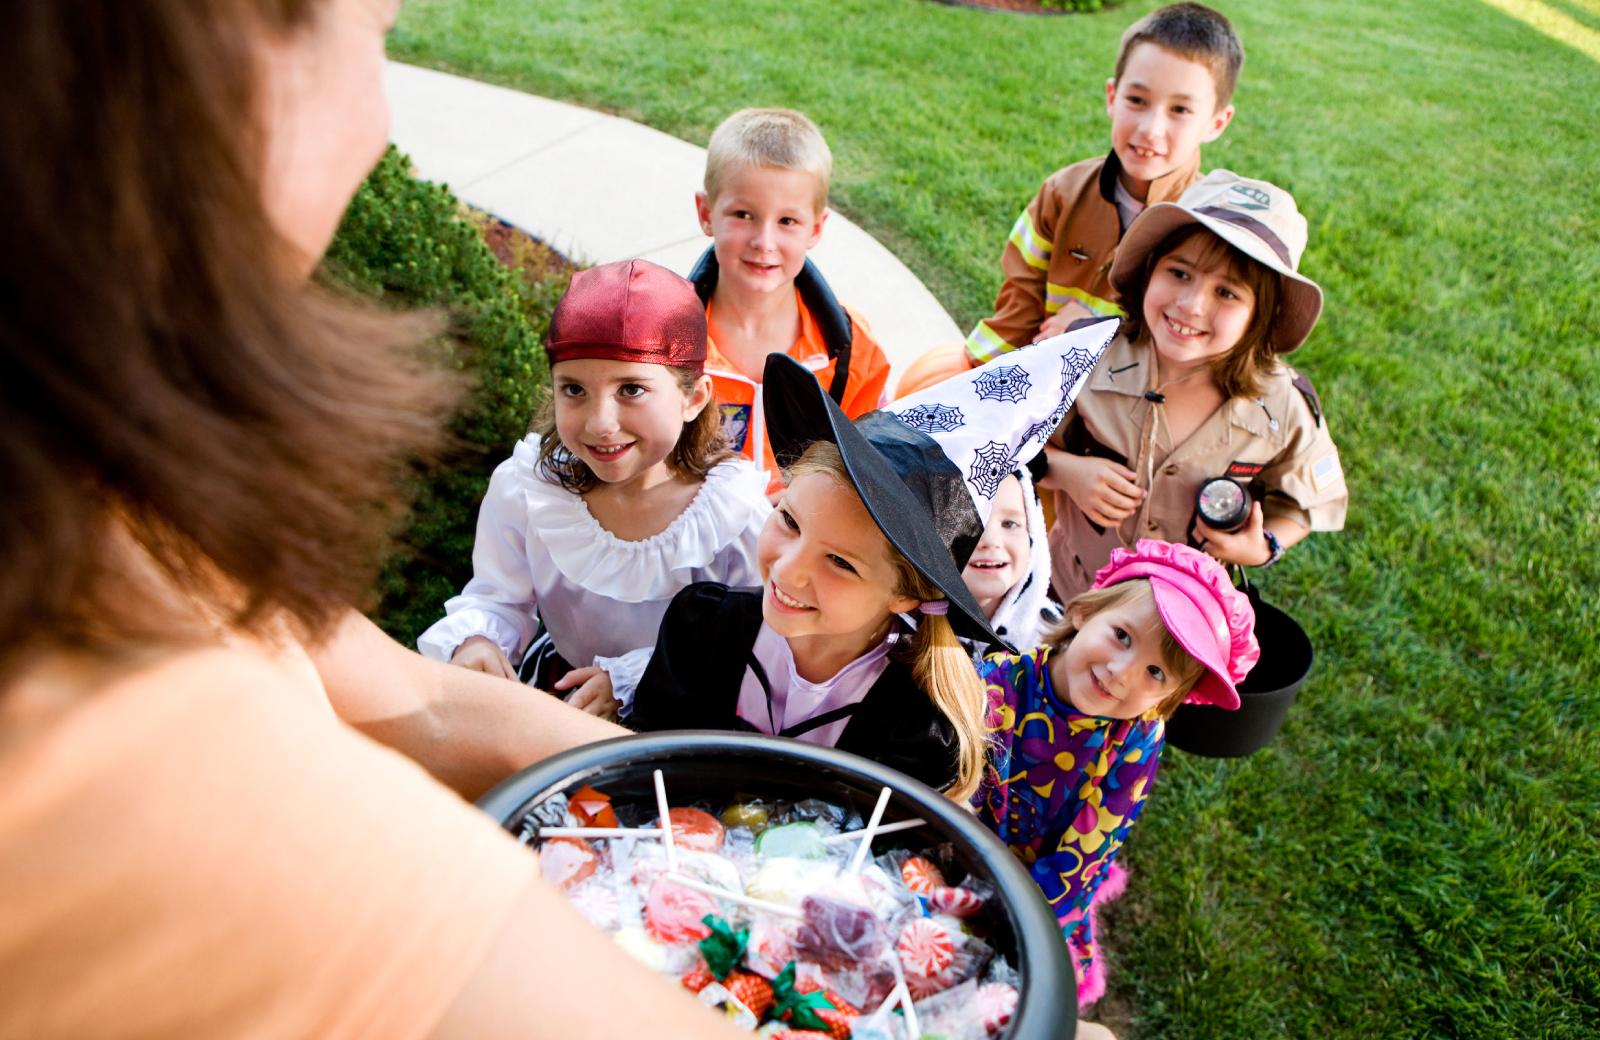 Palo Alto Fall Activities - The Village Residences Apts